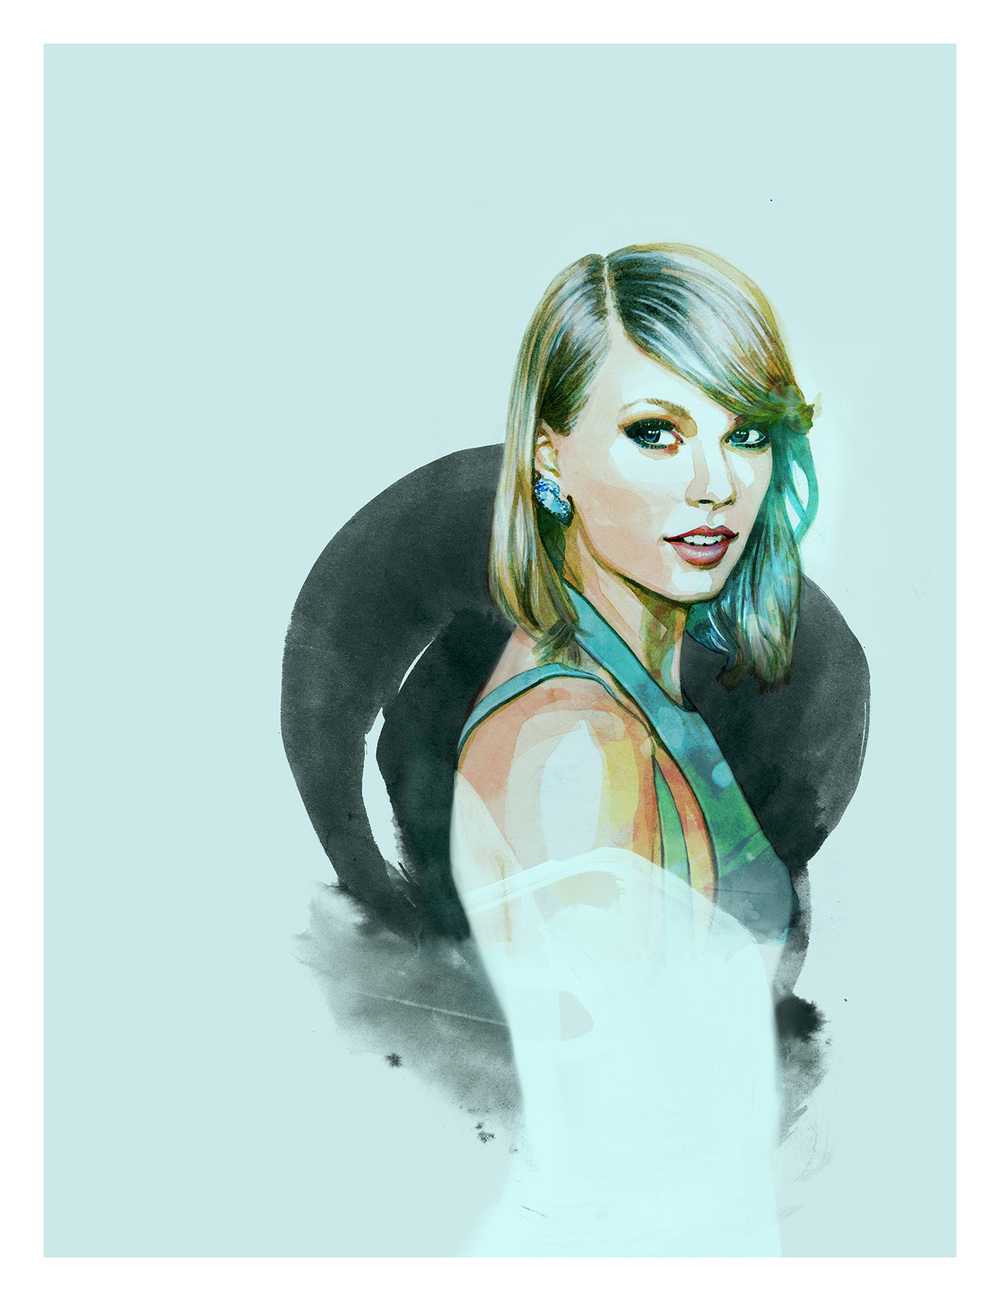 The Queen of Pop / Taylor Swift